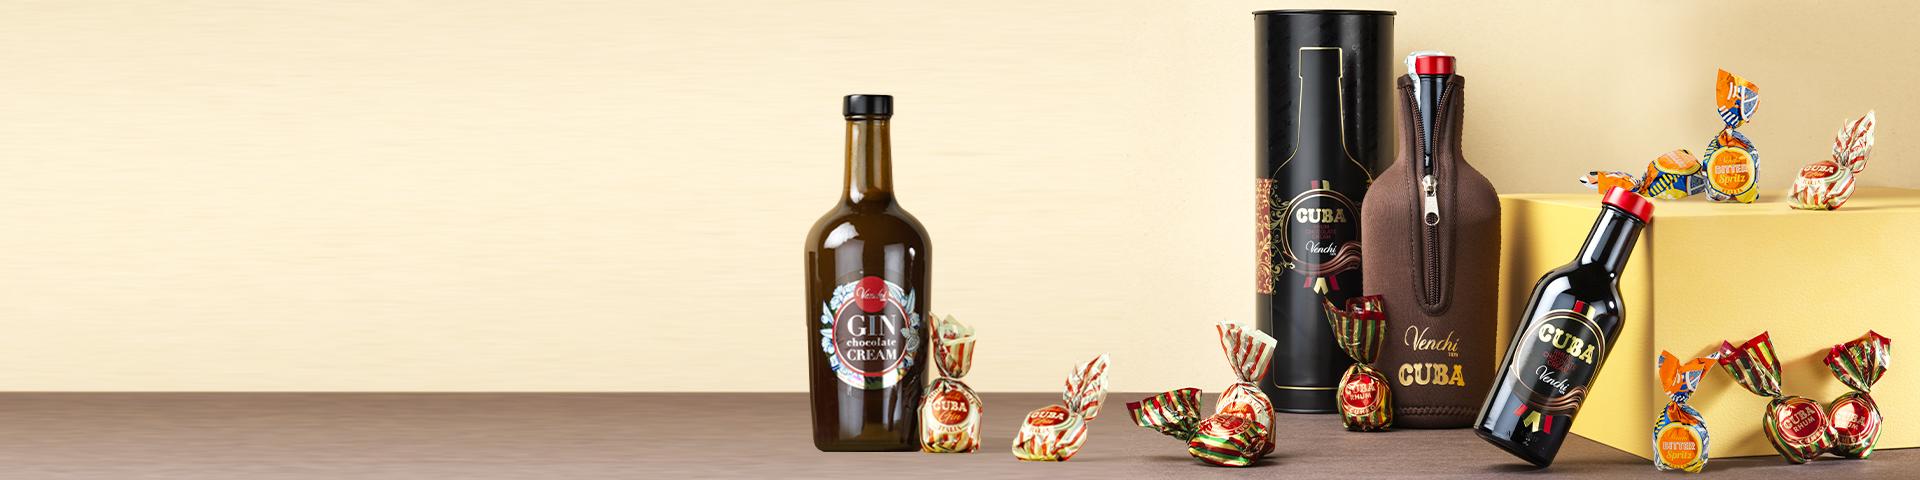 slider-CubaRhum+Gin.jpg